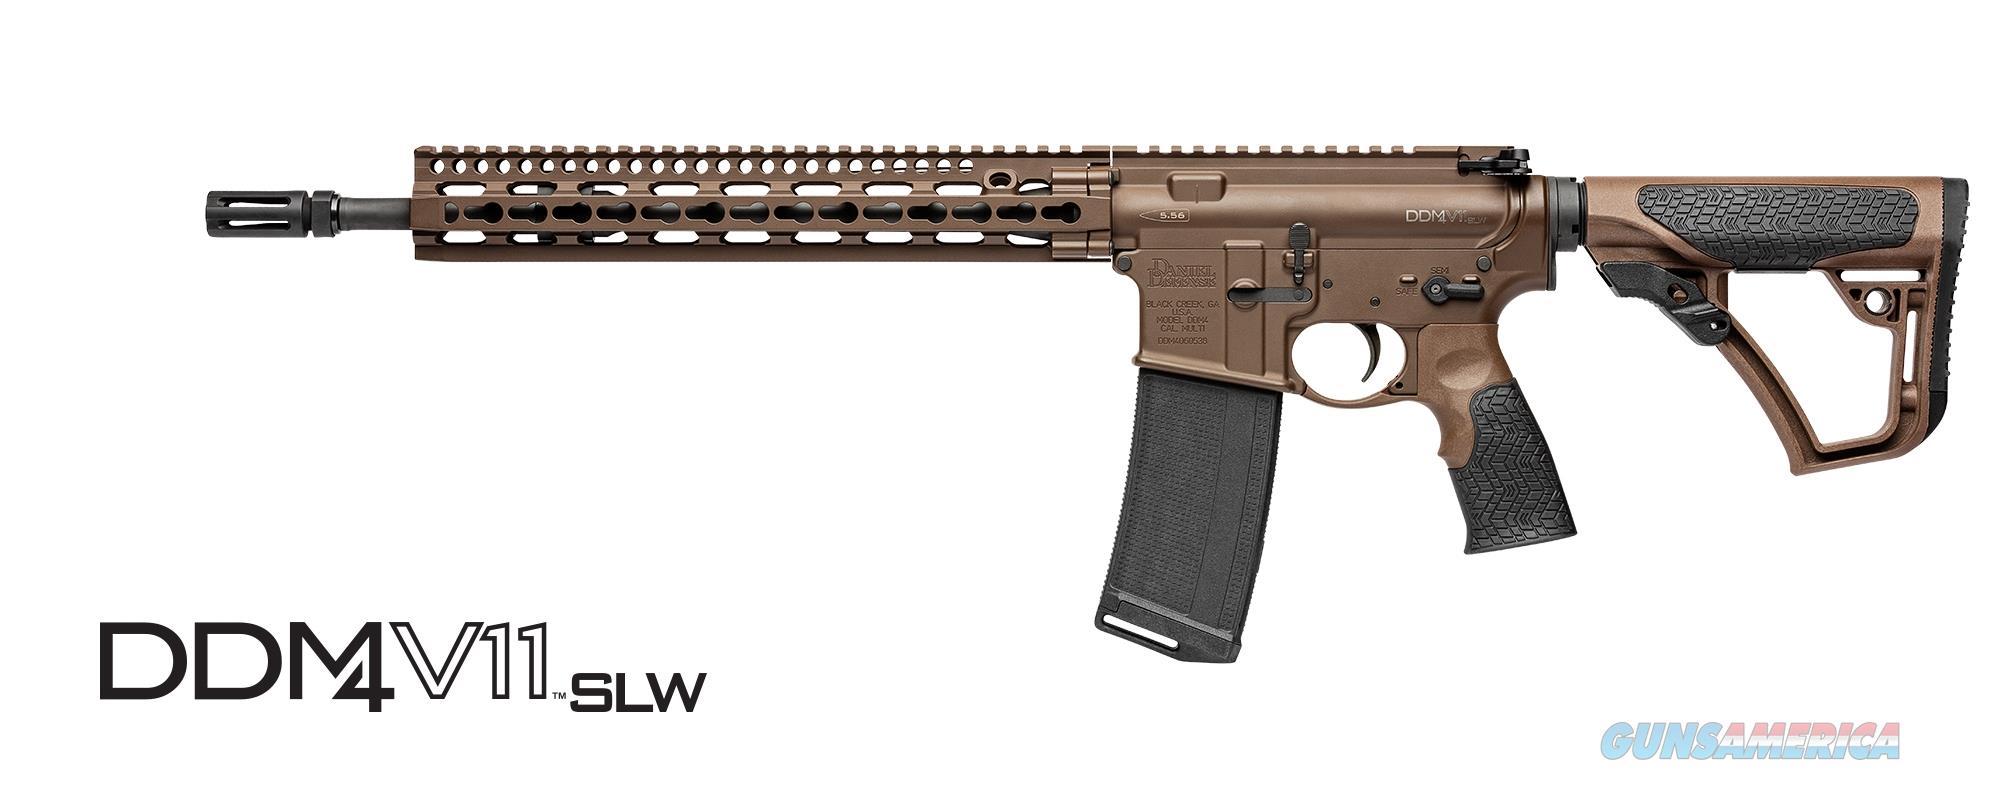 Daniel Defense DDM4V11 SLW Mil Spec+ 5.56mm 02-151-08188-047  Guns > Rifles > Daniel Defense > Complete Rifles